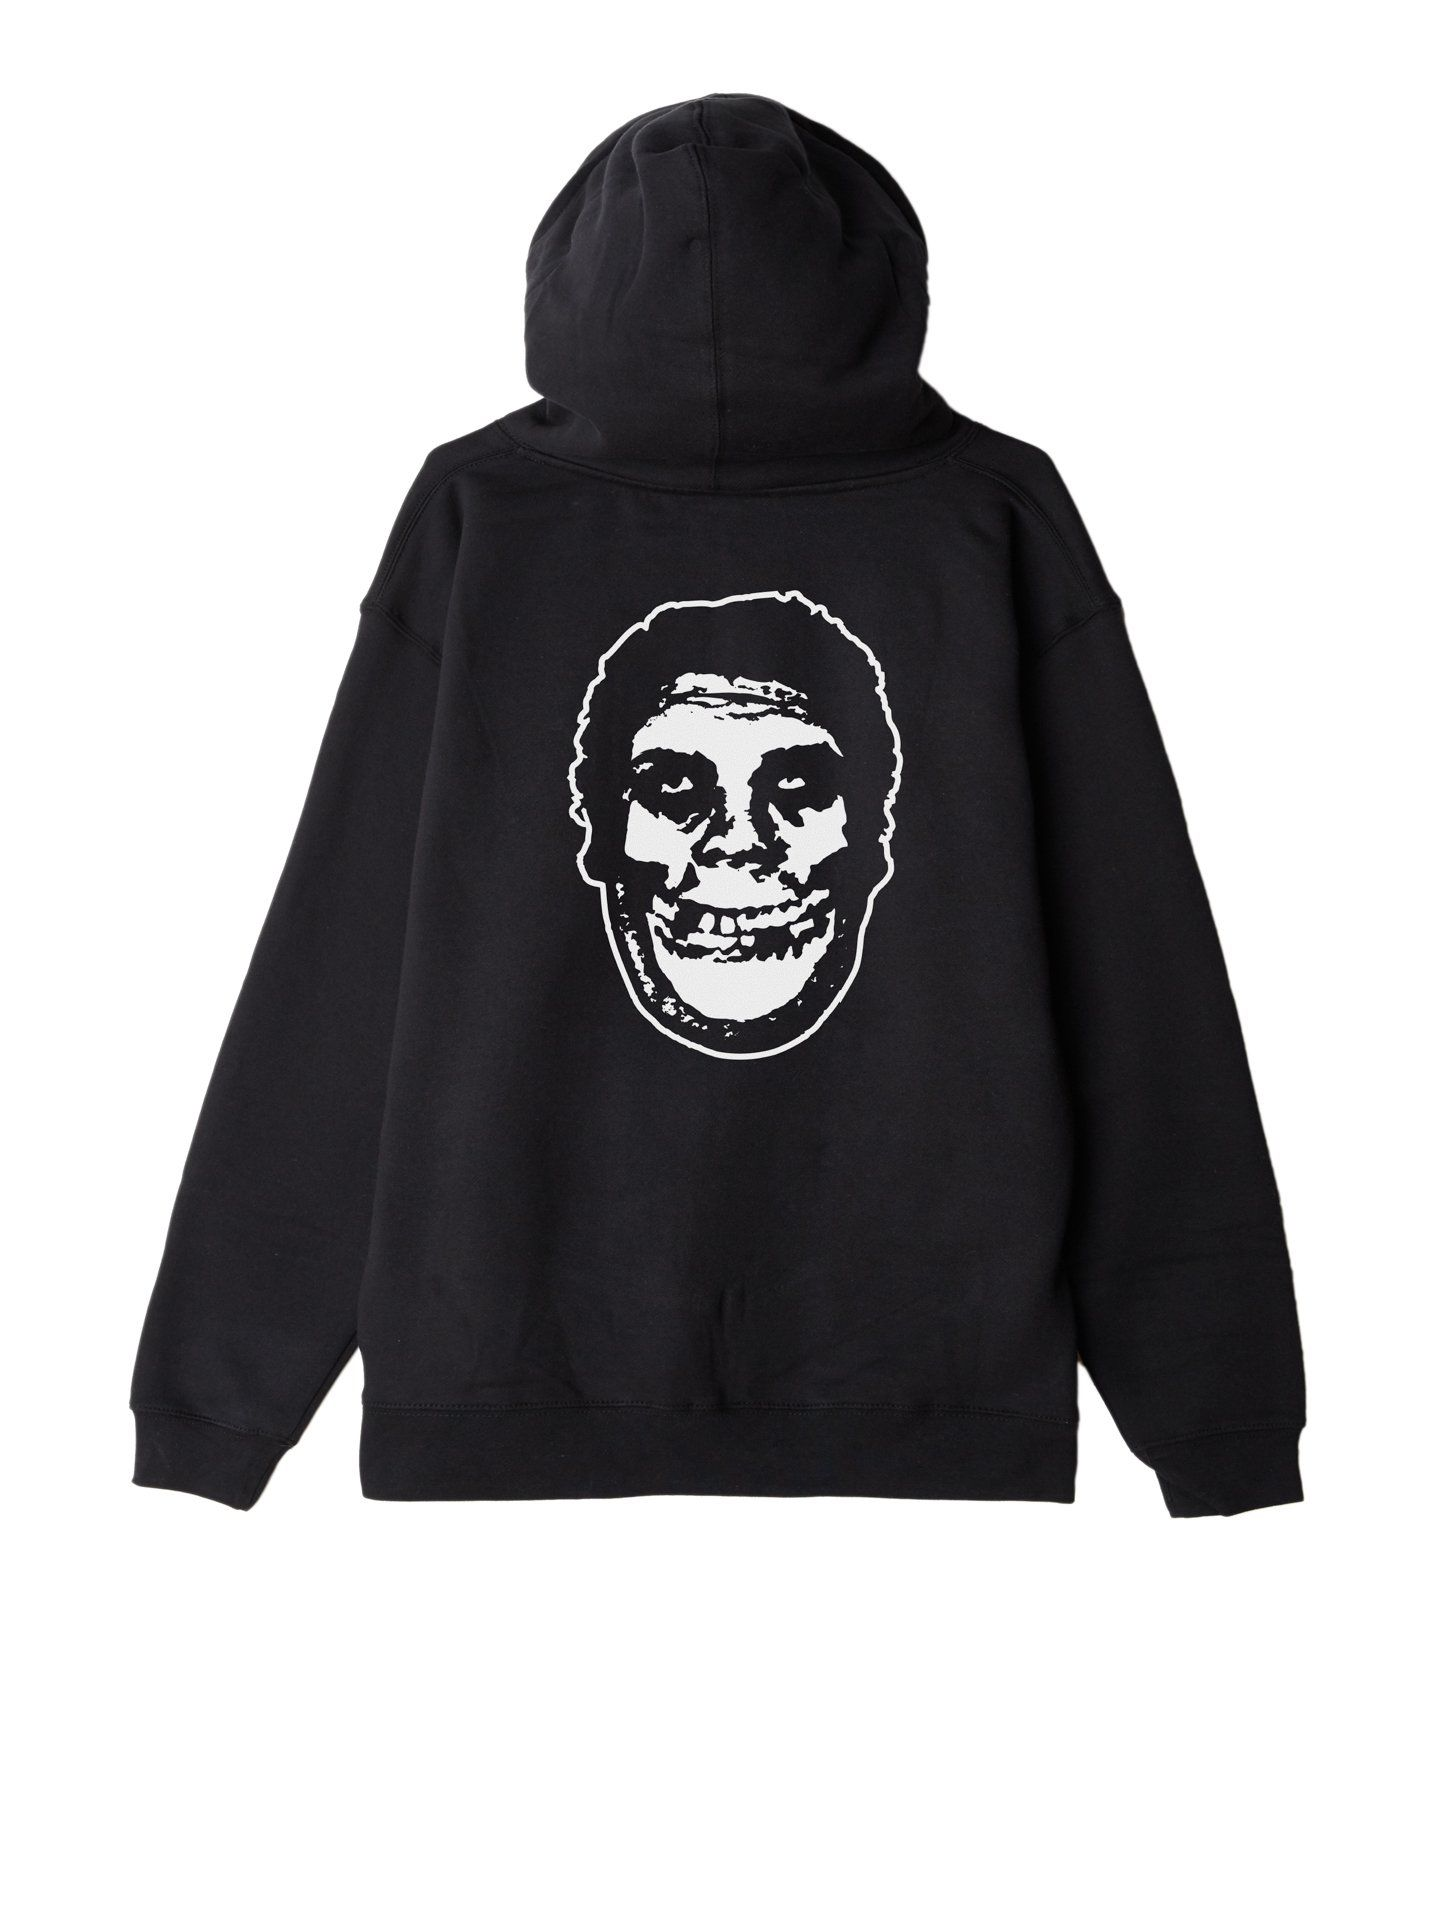 obey x misfits fiend club zip hood black | OBEY Clothing